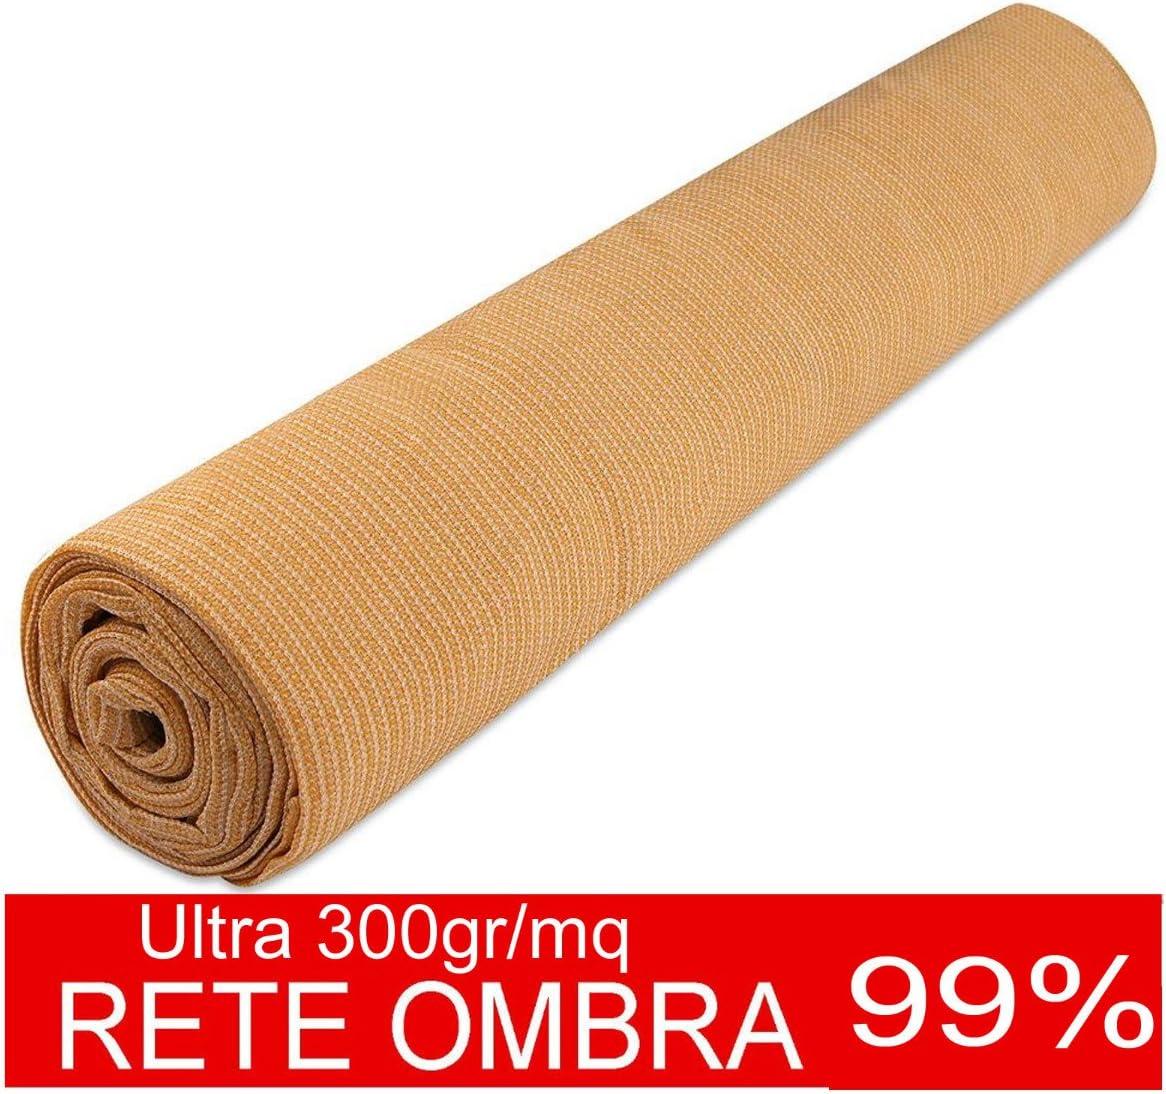 RETE OMBREGGIANTE 90/% TELO OMBRA FRANGIVENTO FRANGIVISTA VERDE H MT 4 x 20